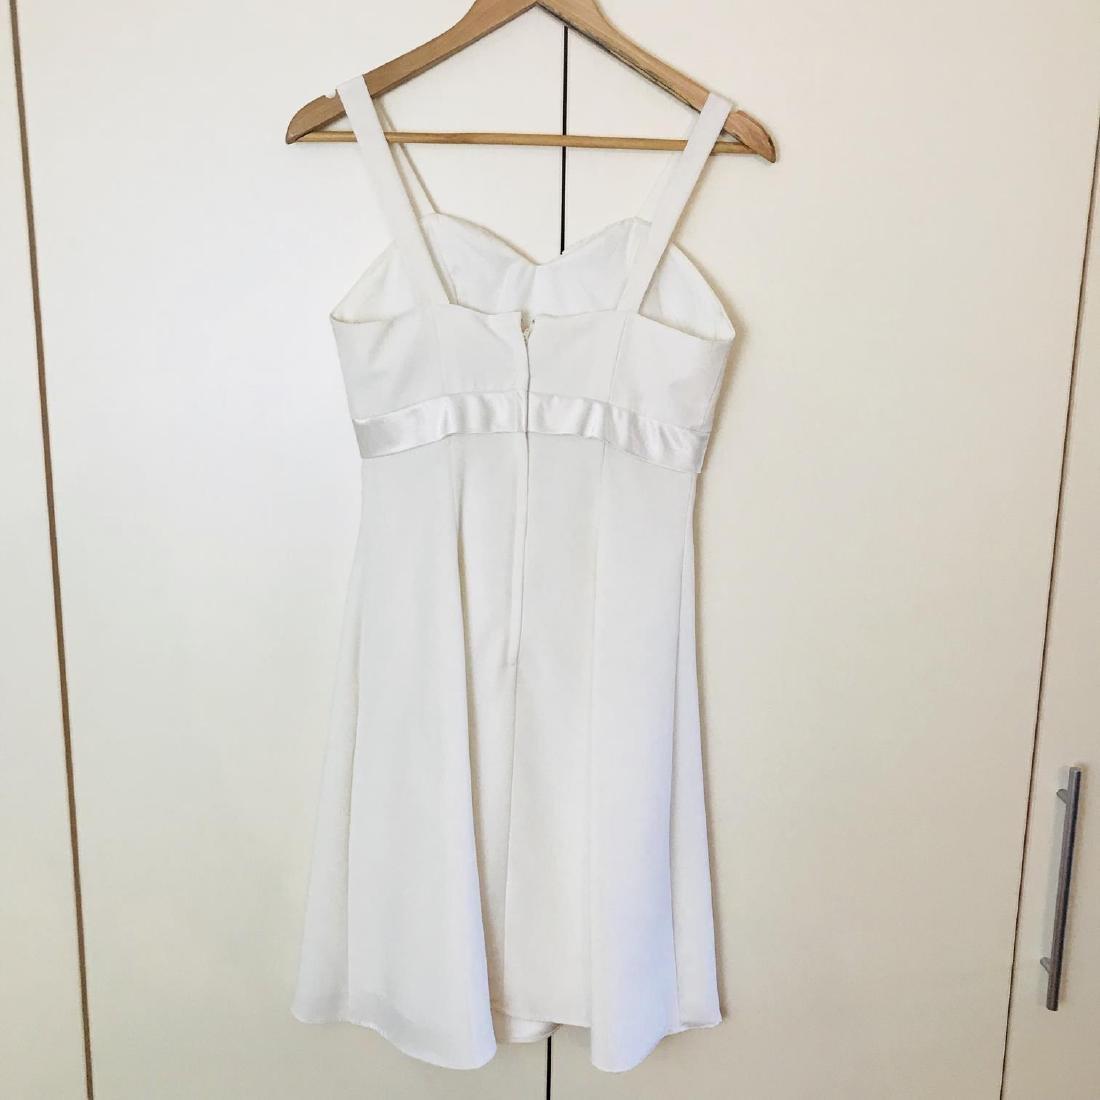 Vintage Women's White Designer Dress Size US 8 EUR 38 - 7